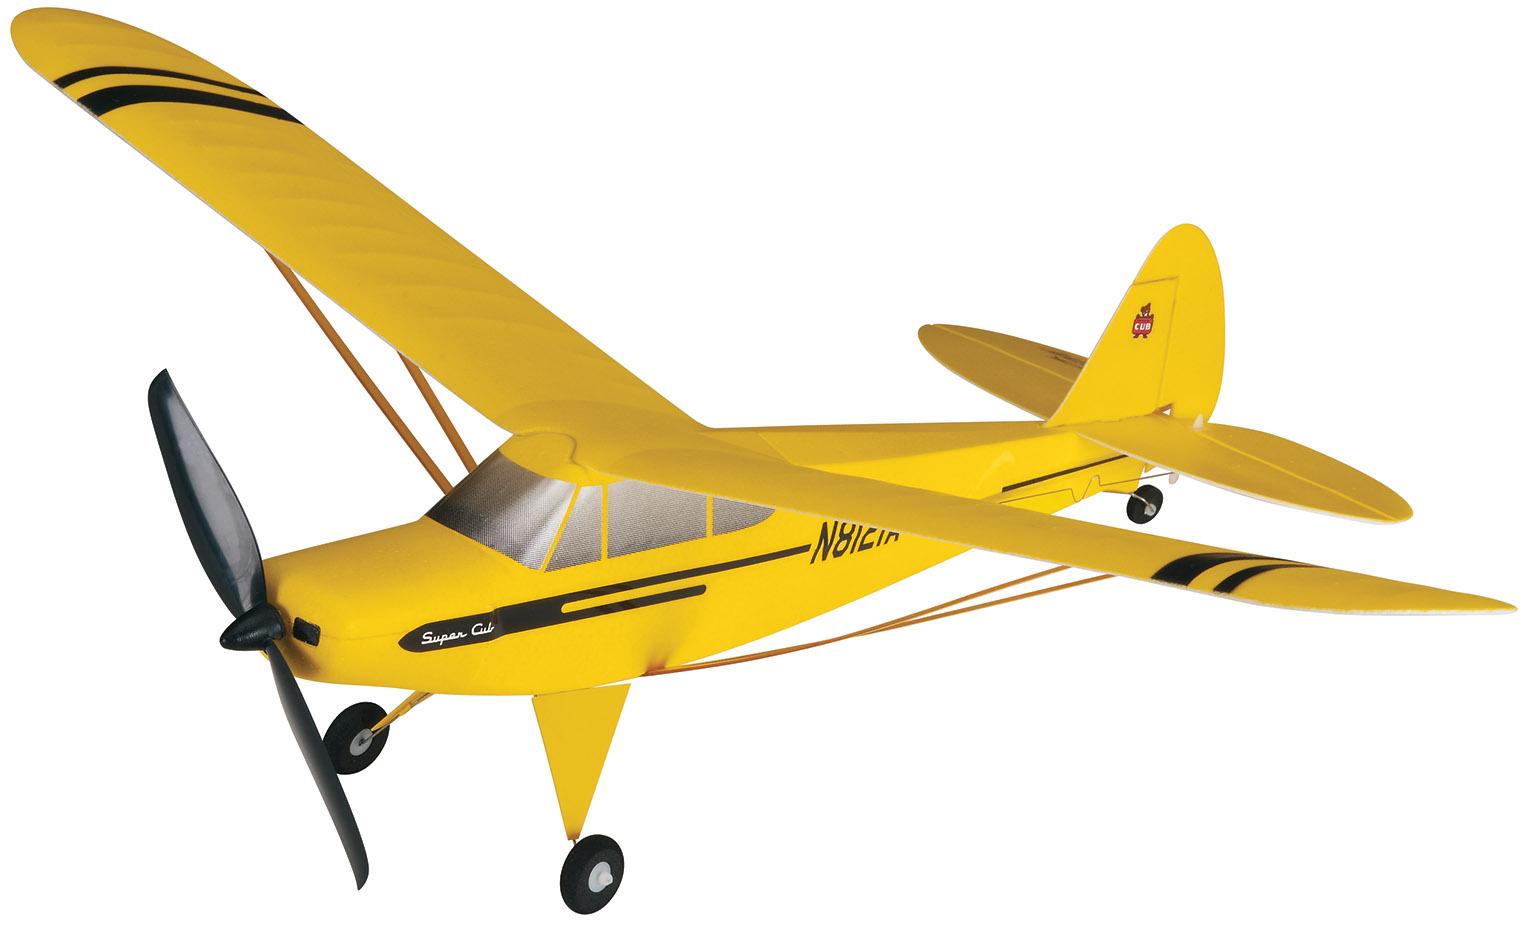 Flyzone Micro Super Cub RTF